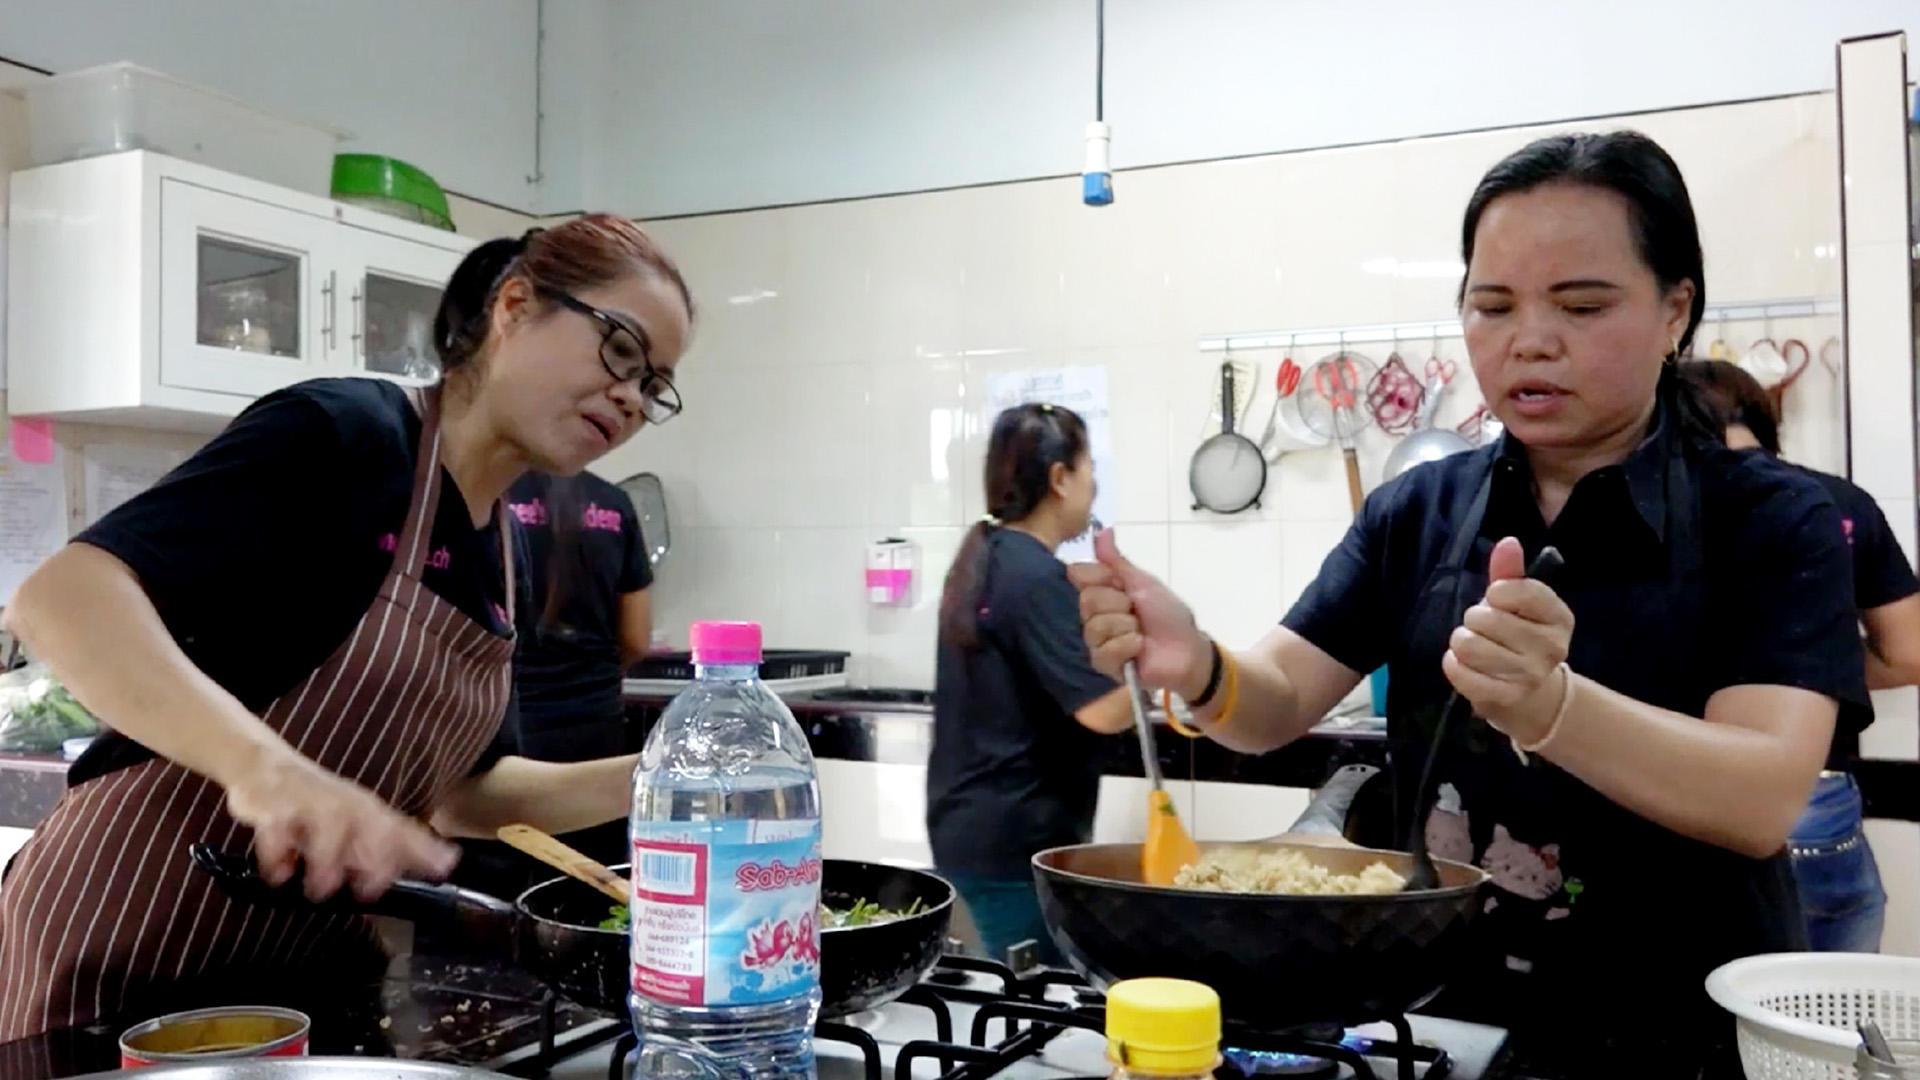 Lebensabend im Paradies - Rentner in Thailand | Folge 12